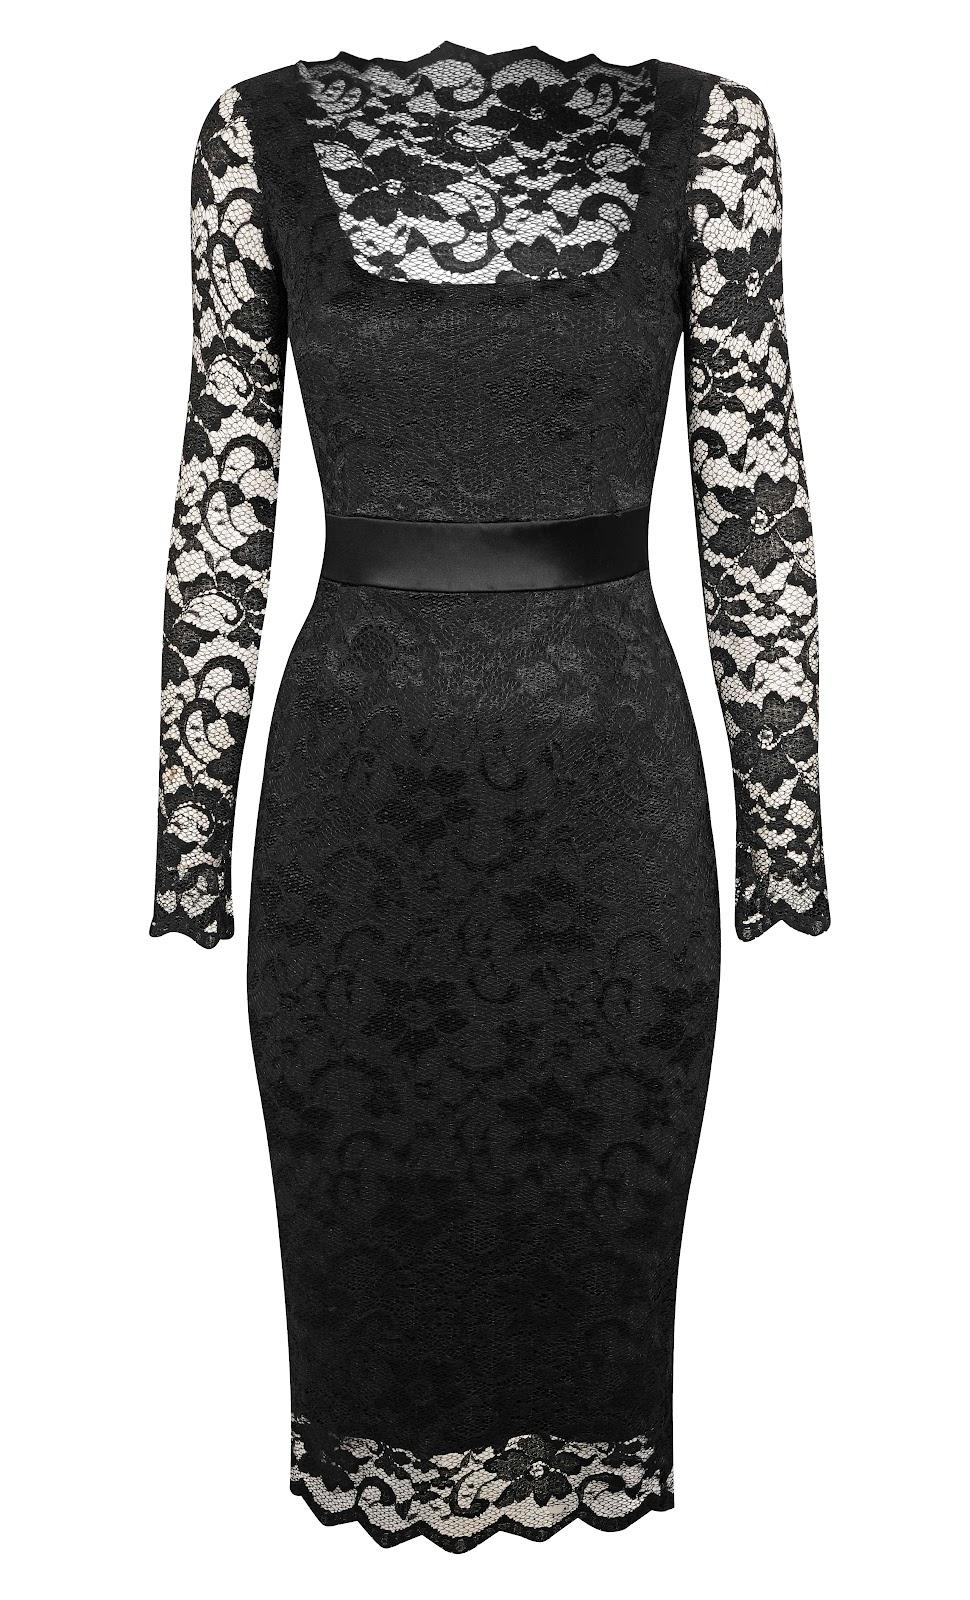 Sam faiers black lace dress stony heart fashion fashion detective